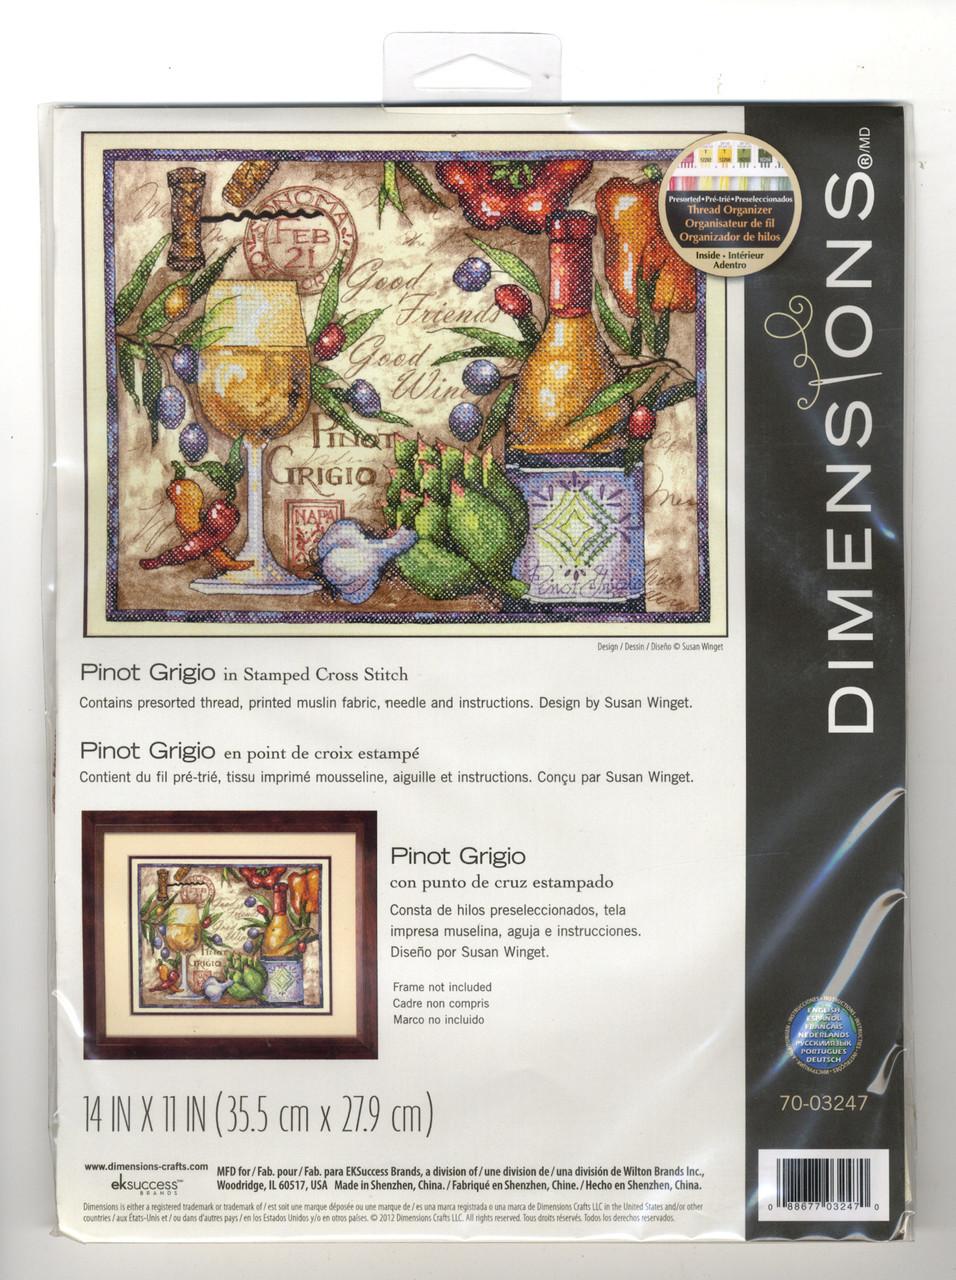 Dimensions - Pinot Grigio